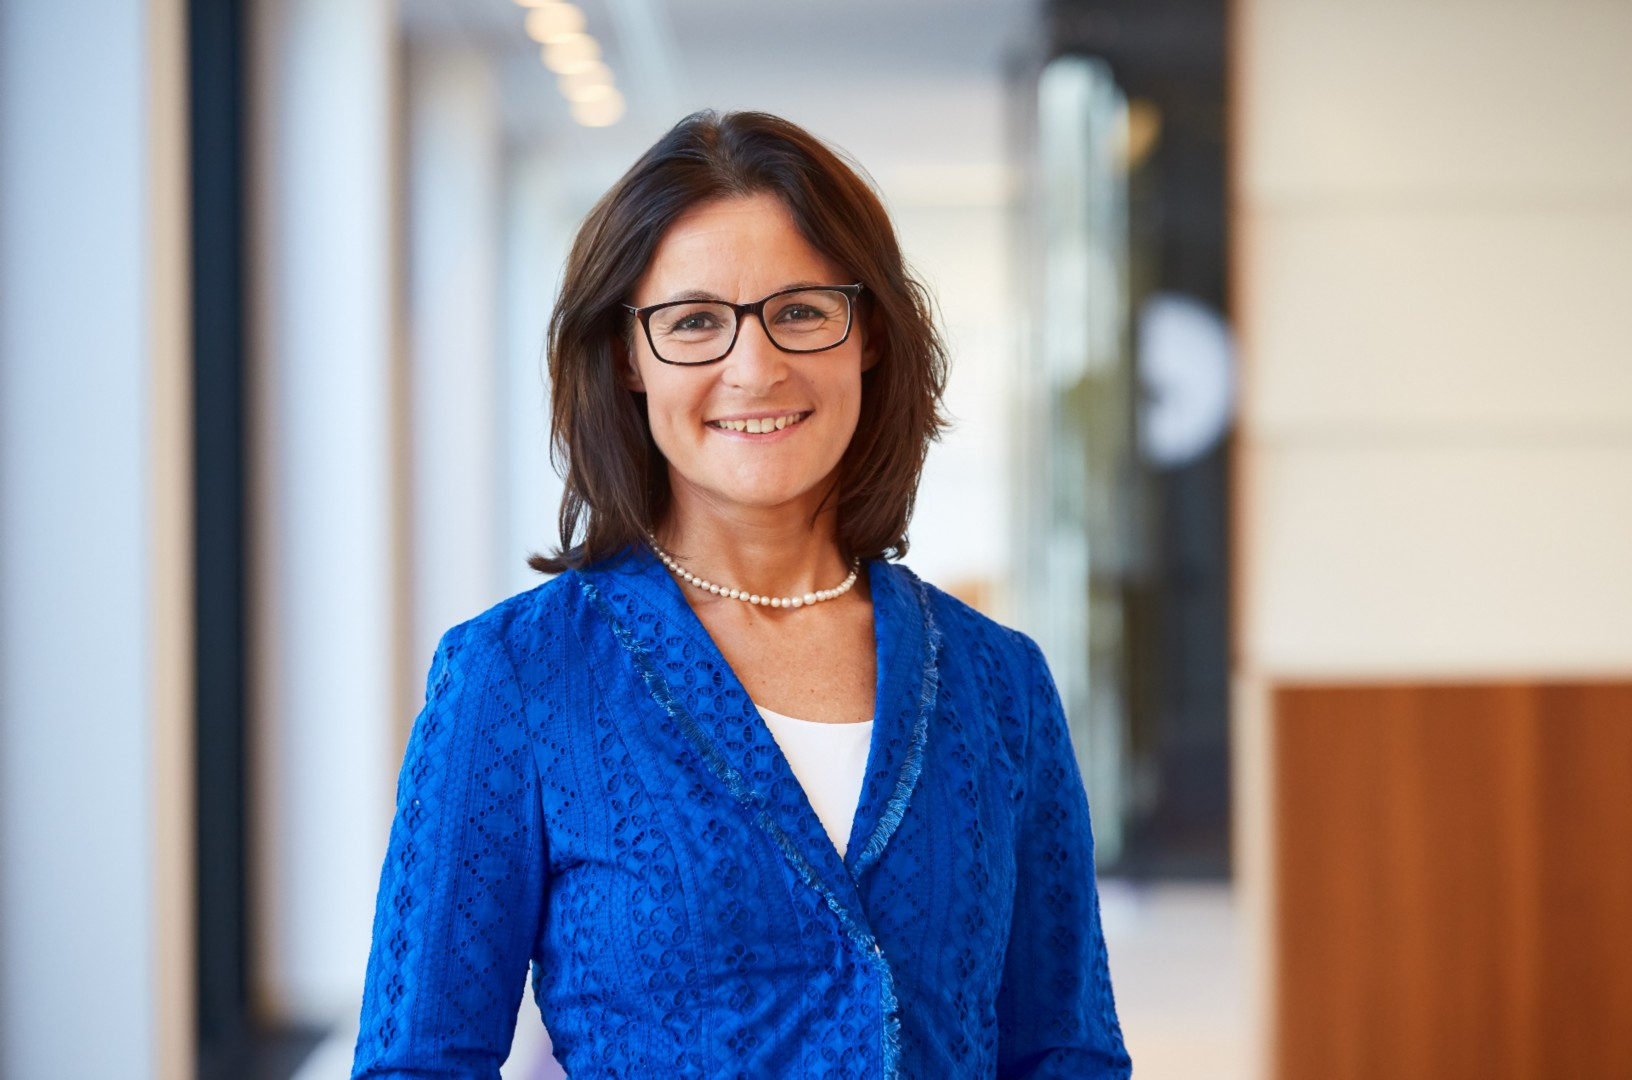 Ursula Kriegl - Associate Partner, Ernst & Young Real Estate GmbH